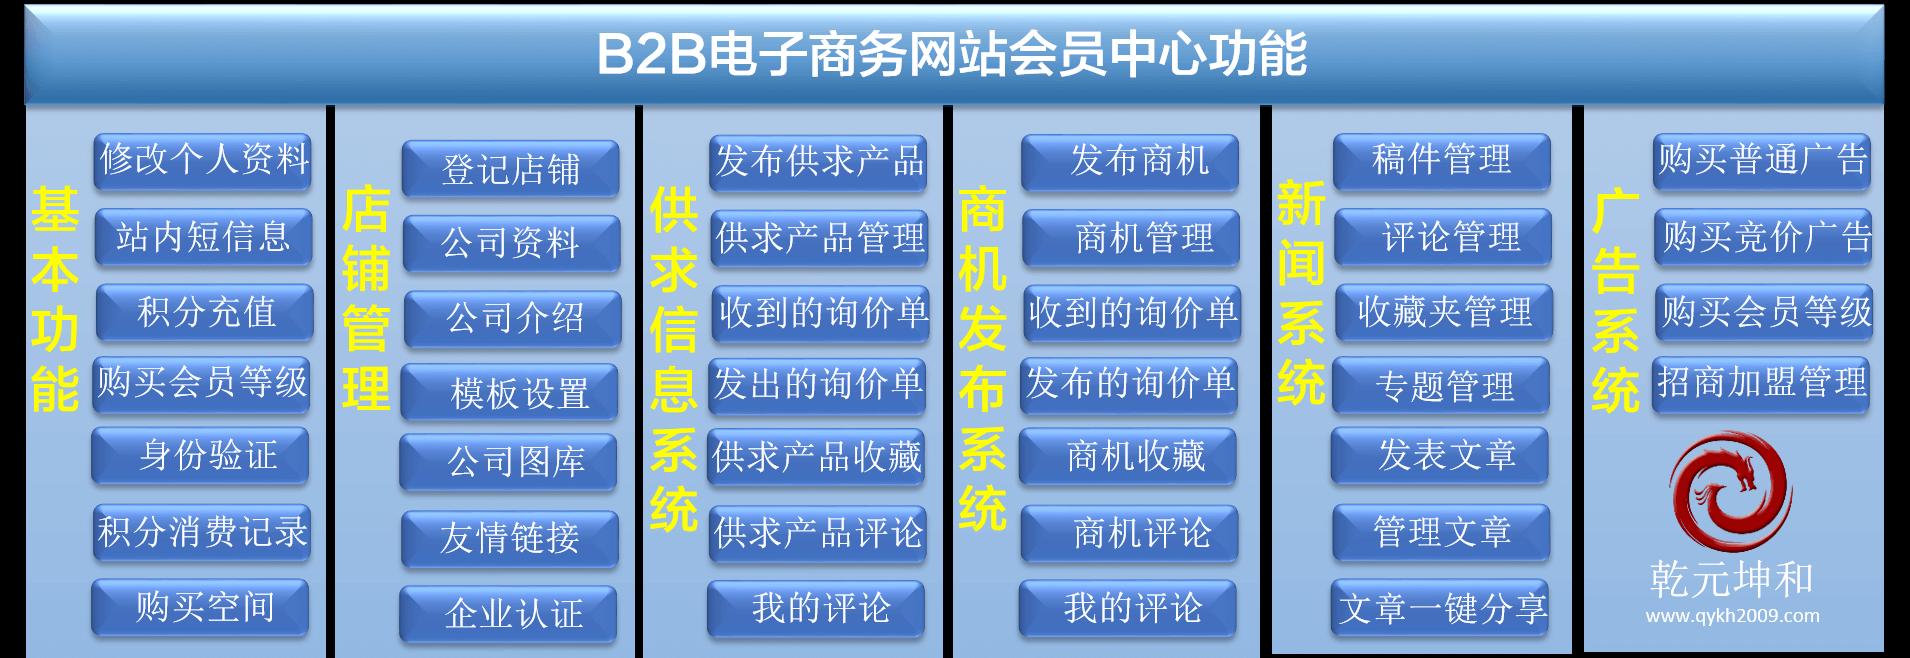 B2B网站功能